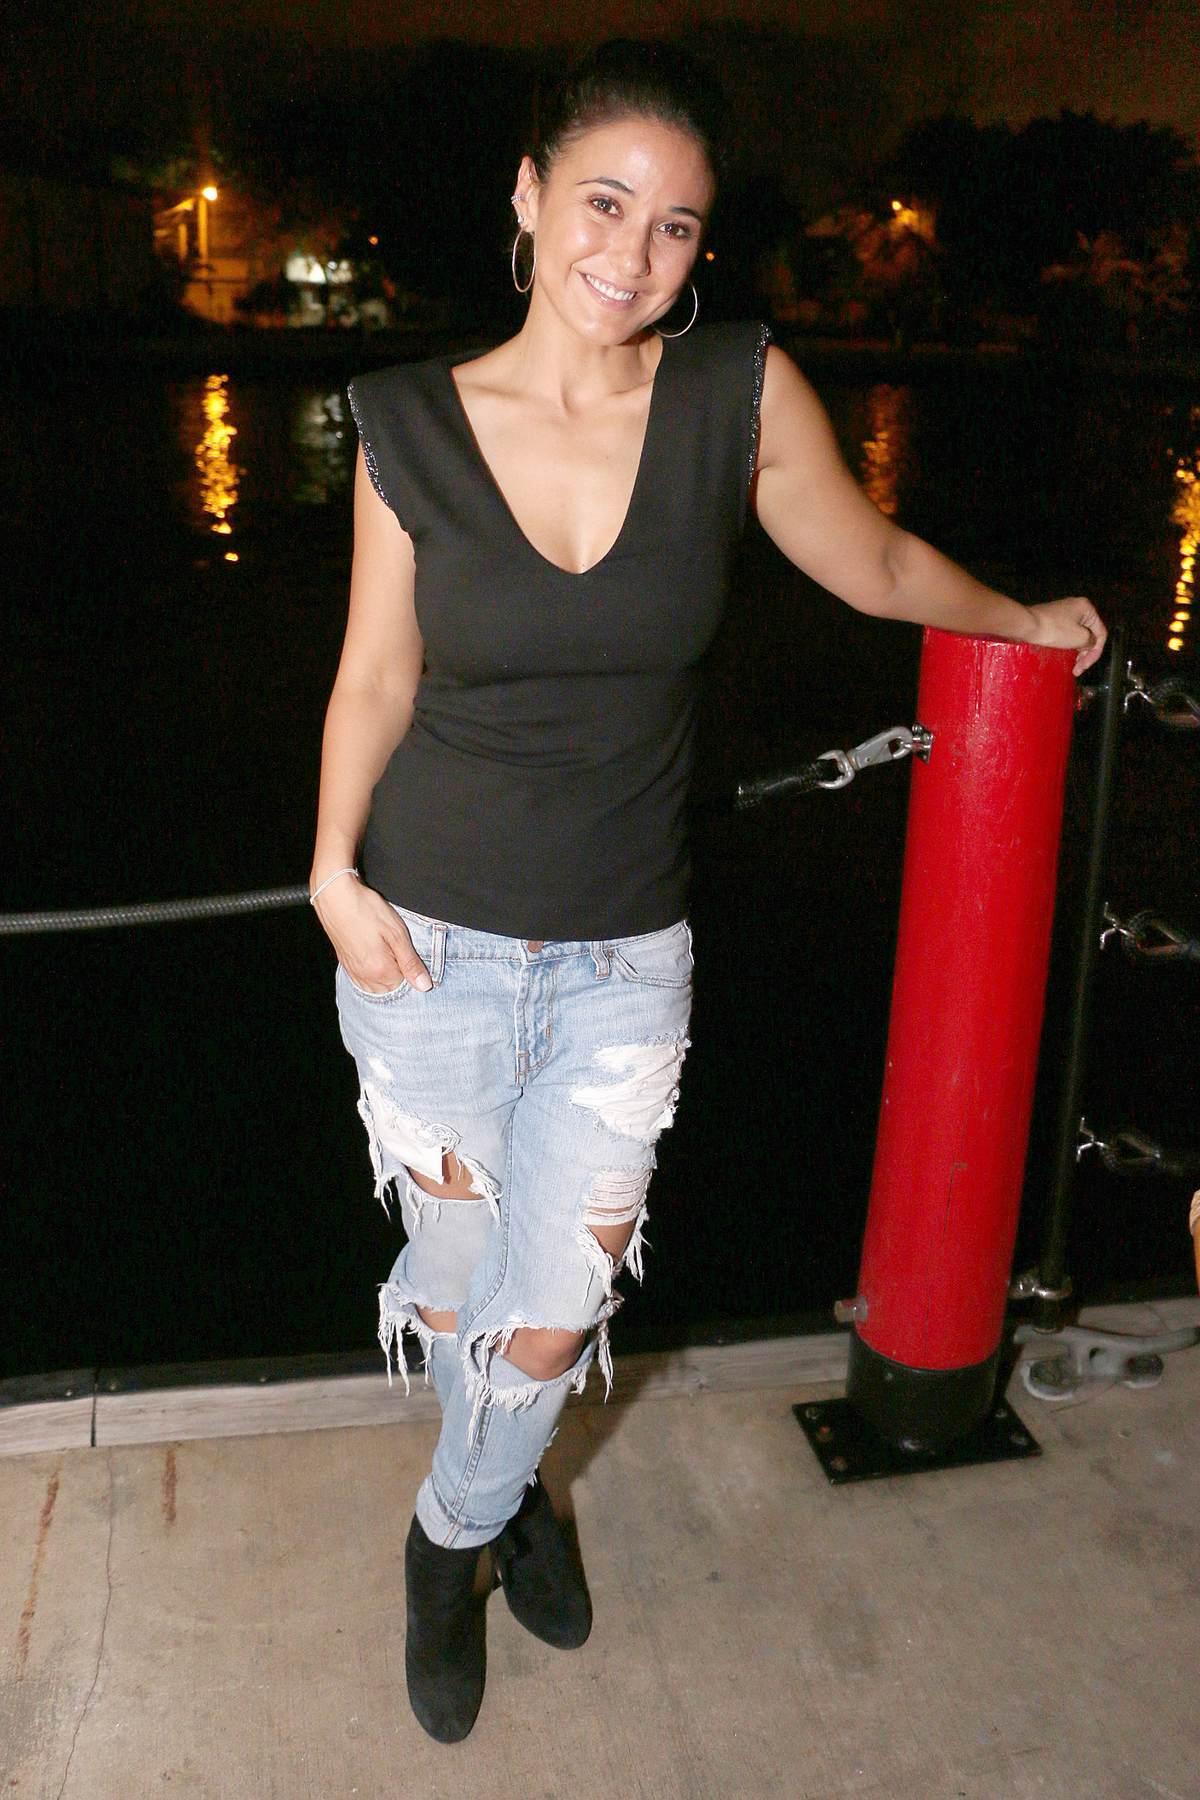 Emmanuelle Chriqui at Seaspice in Miami-2